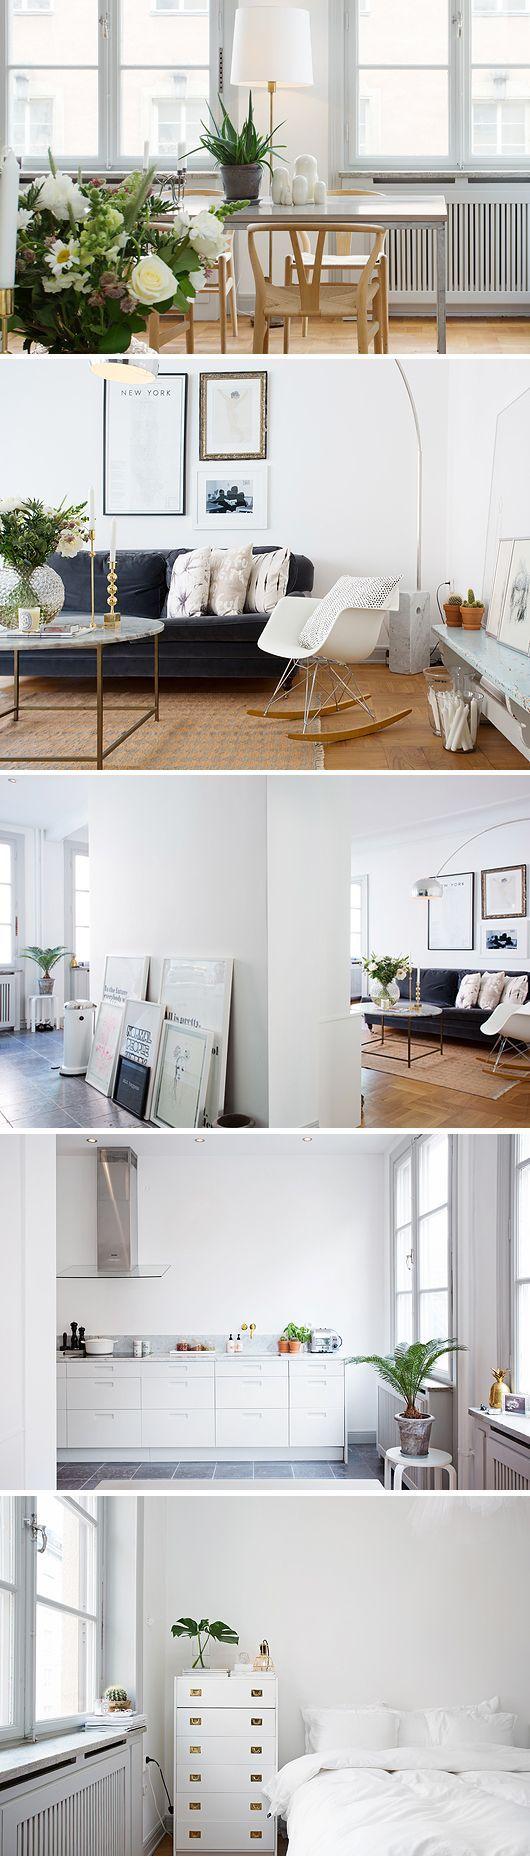 Scandinavian design. Some really smart room composition happening here.